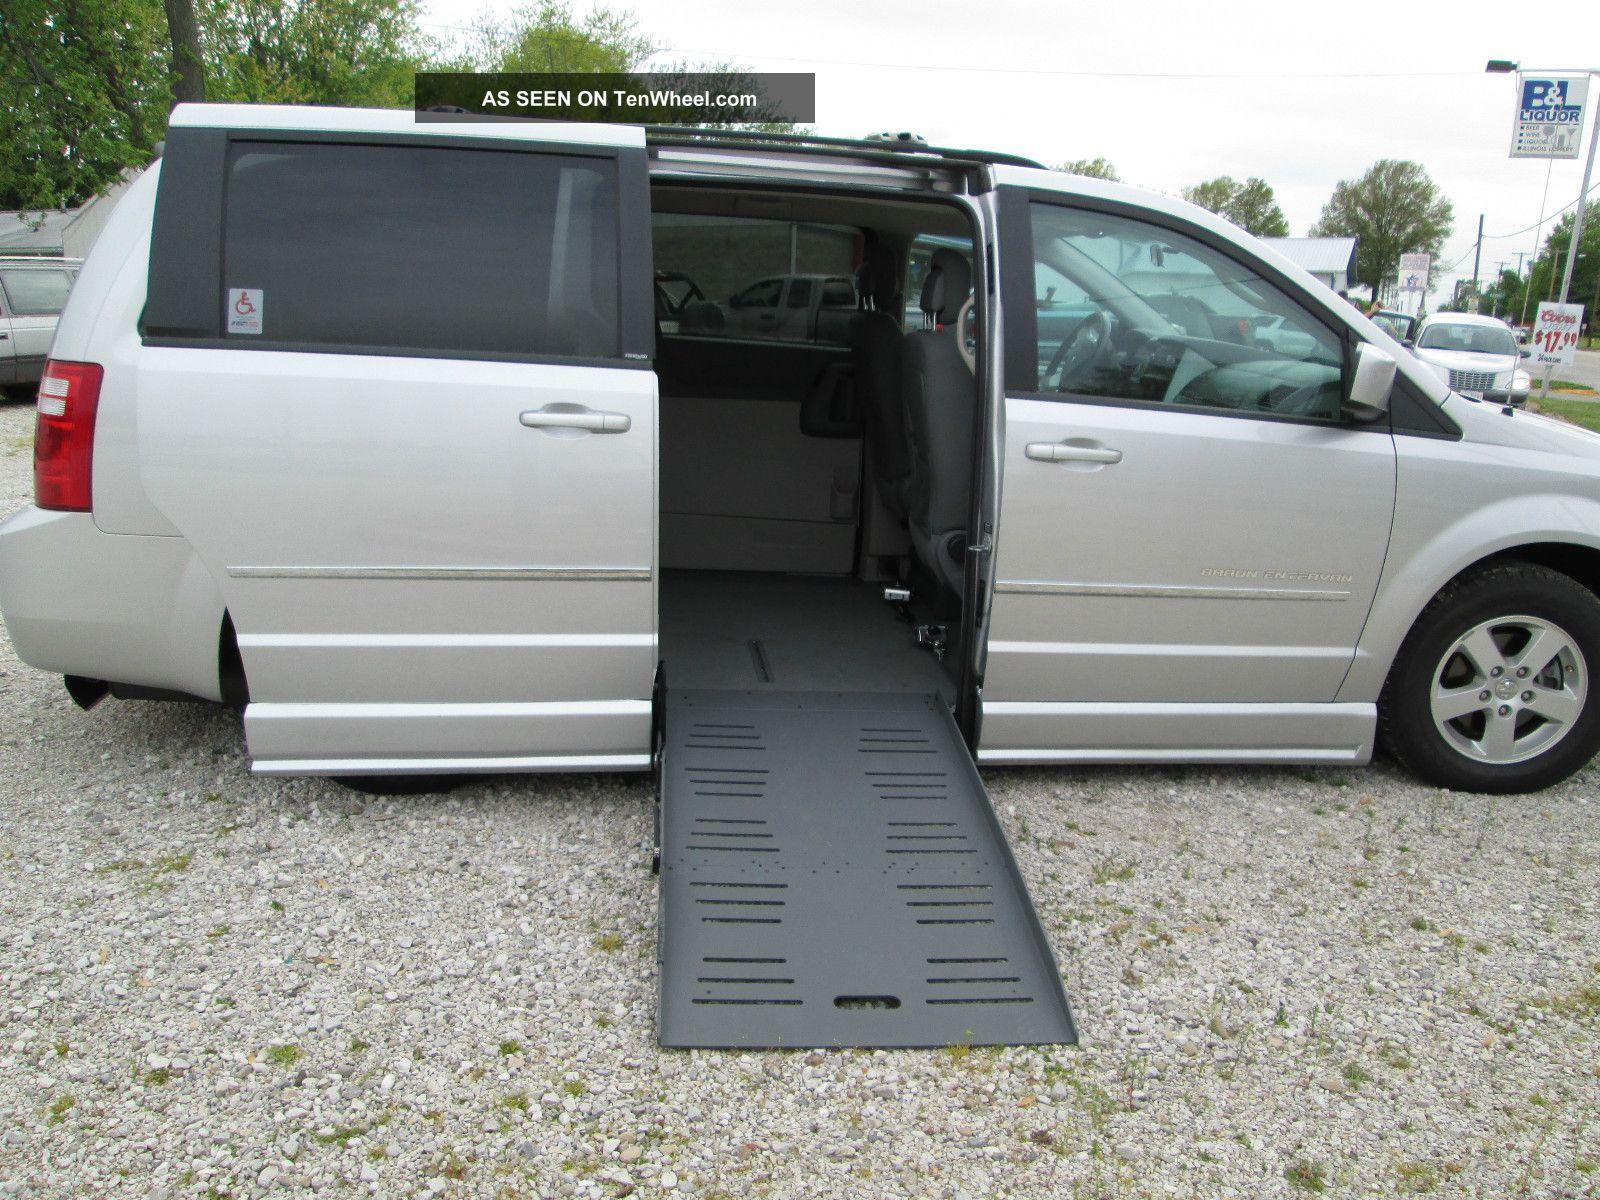 2010 Dodge Grand Caravan Braun Entervan Ii Grand Caravan photo